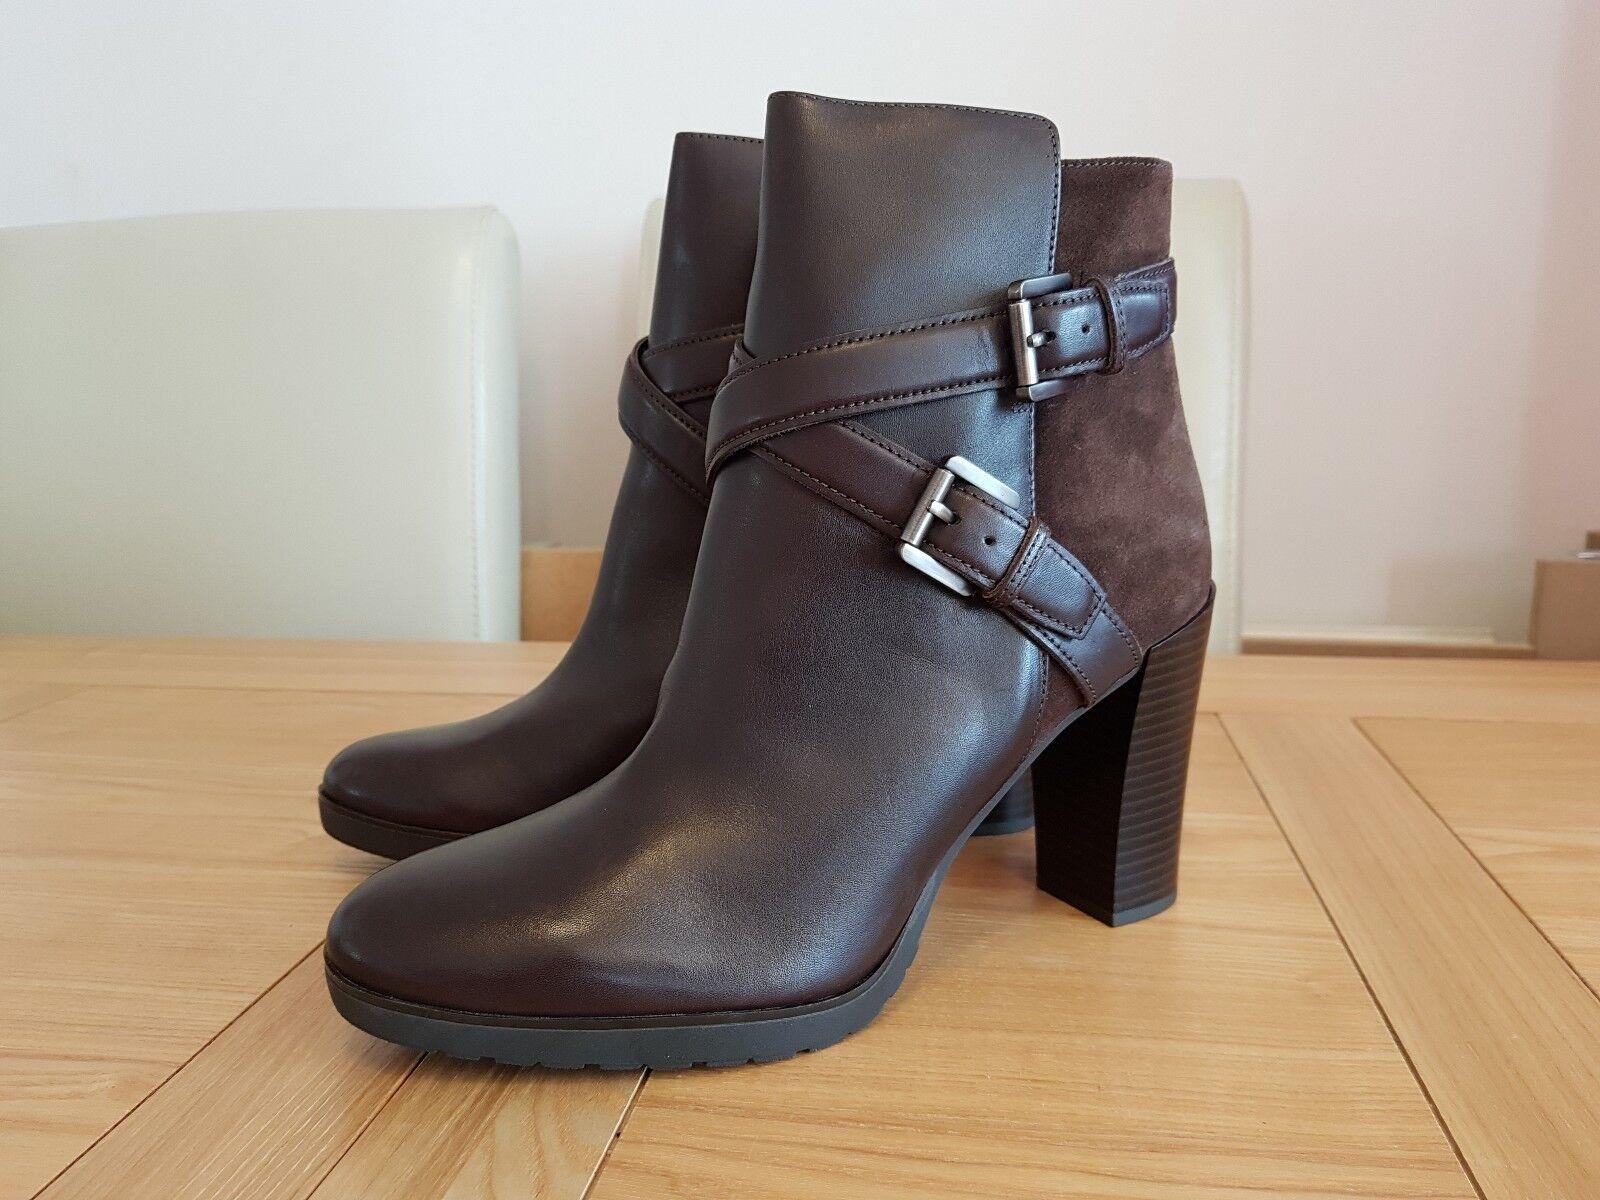 Geox Damenschuhe Respira Amphibiox Raphal A Damenschuhe Braun Leder Suede Ankle Stiefel